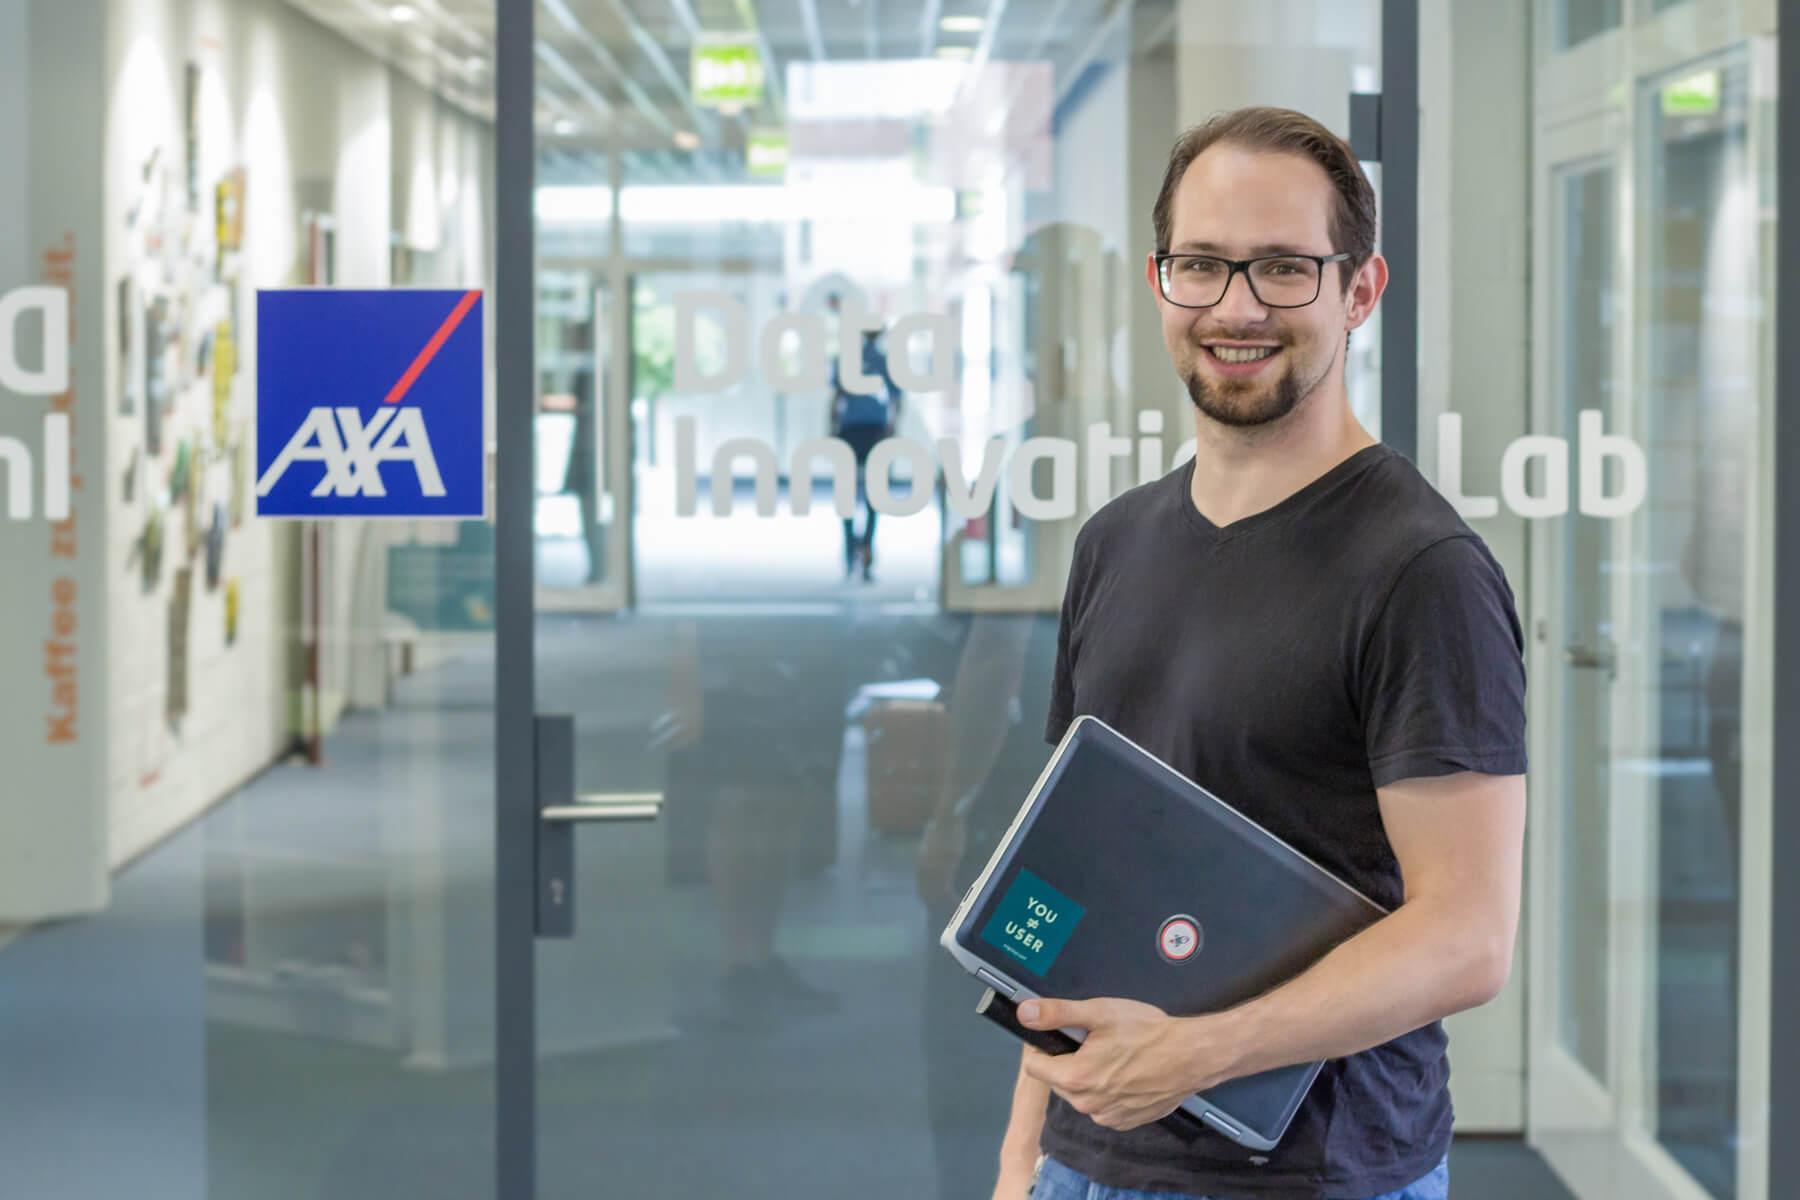 Matthias Denke, UX Manager